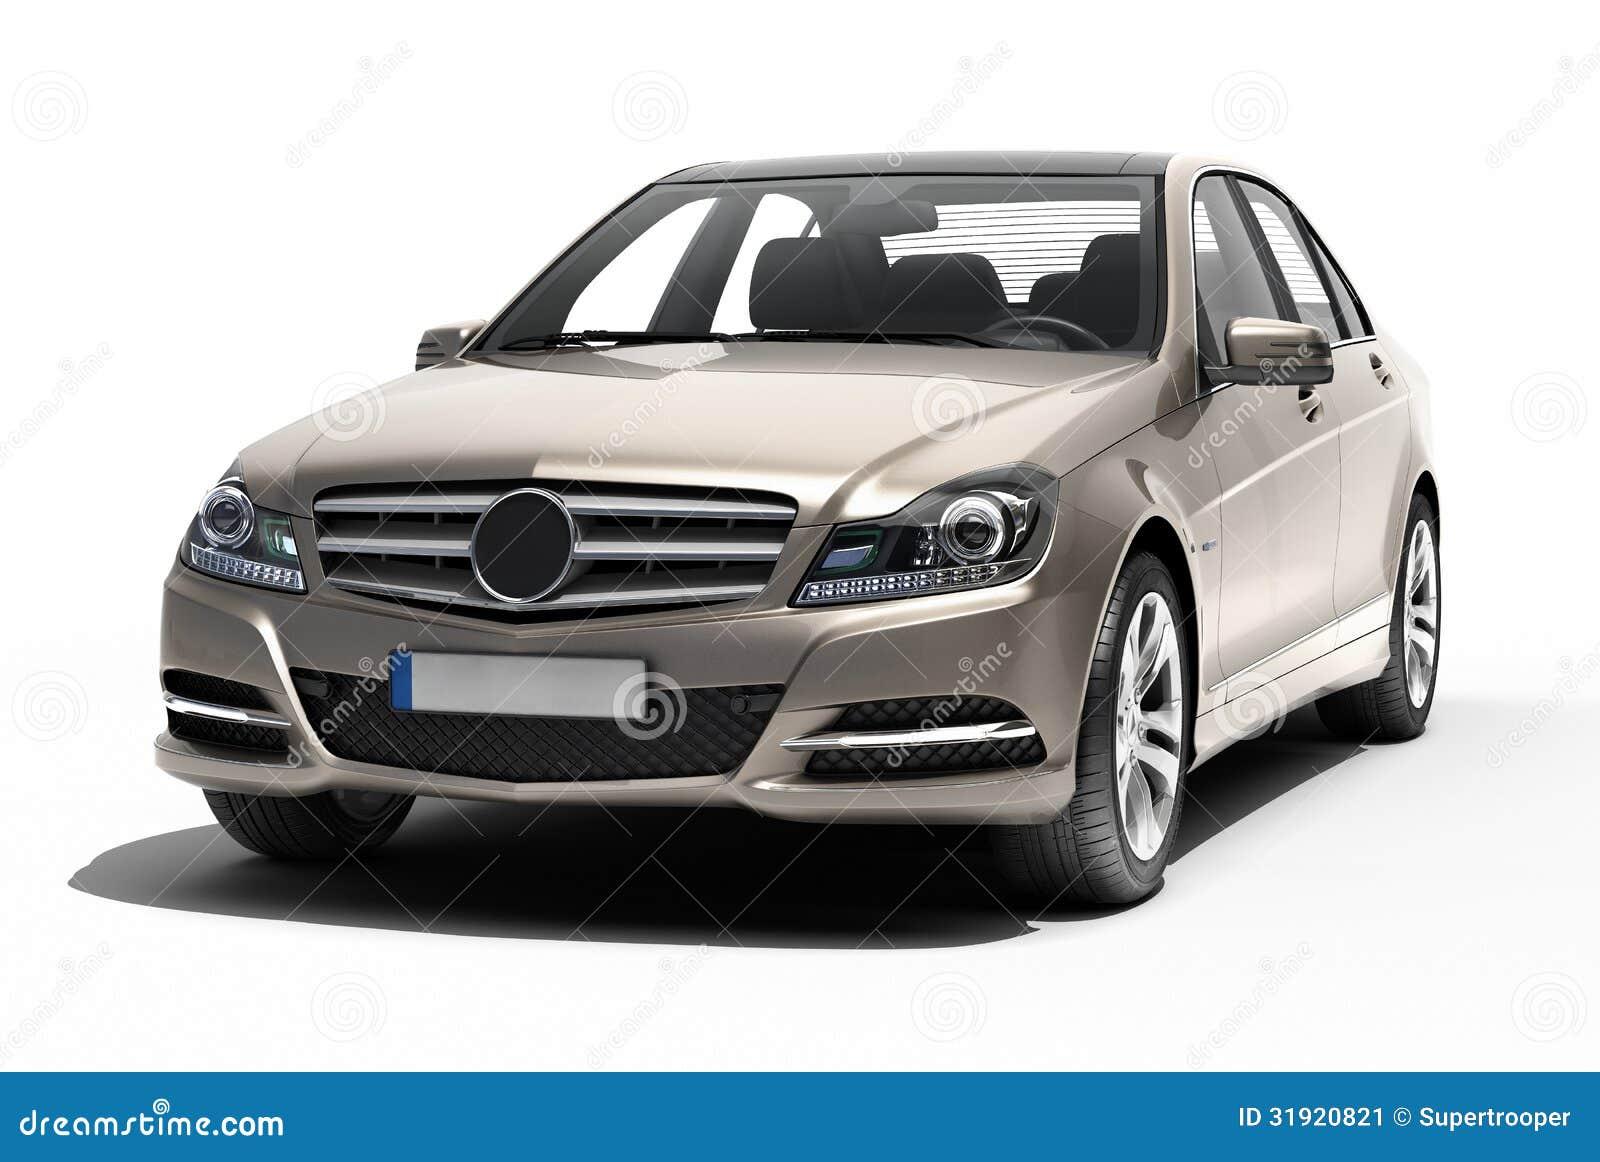 Contemporary Luxury Car Isolated Stock Image Image 31920821